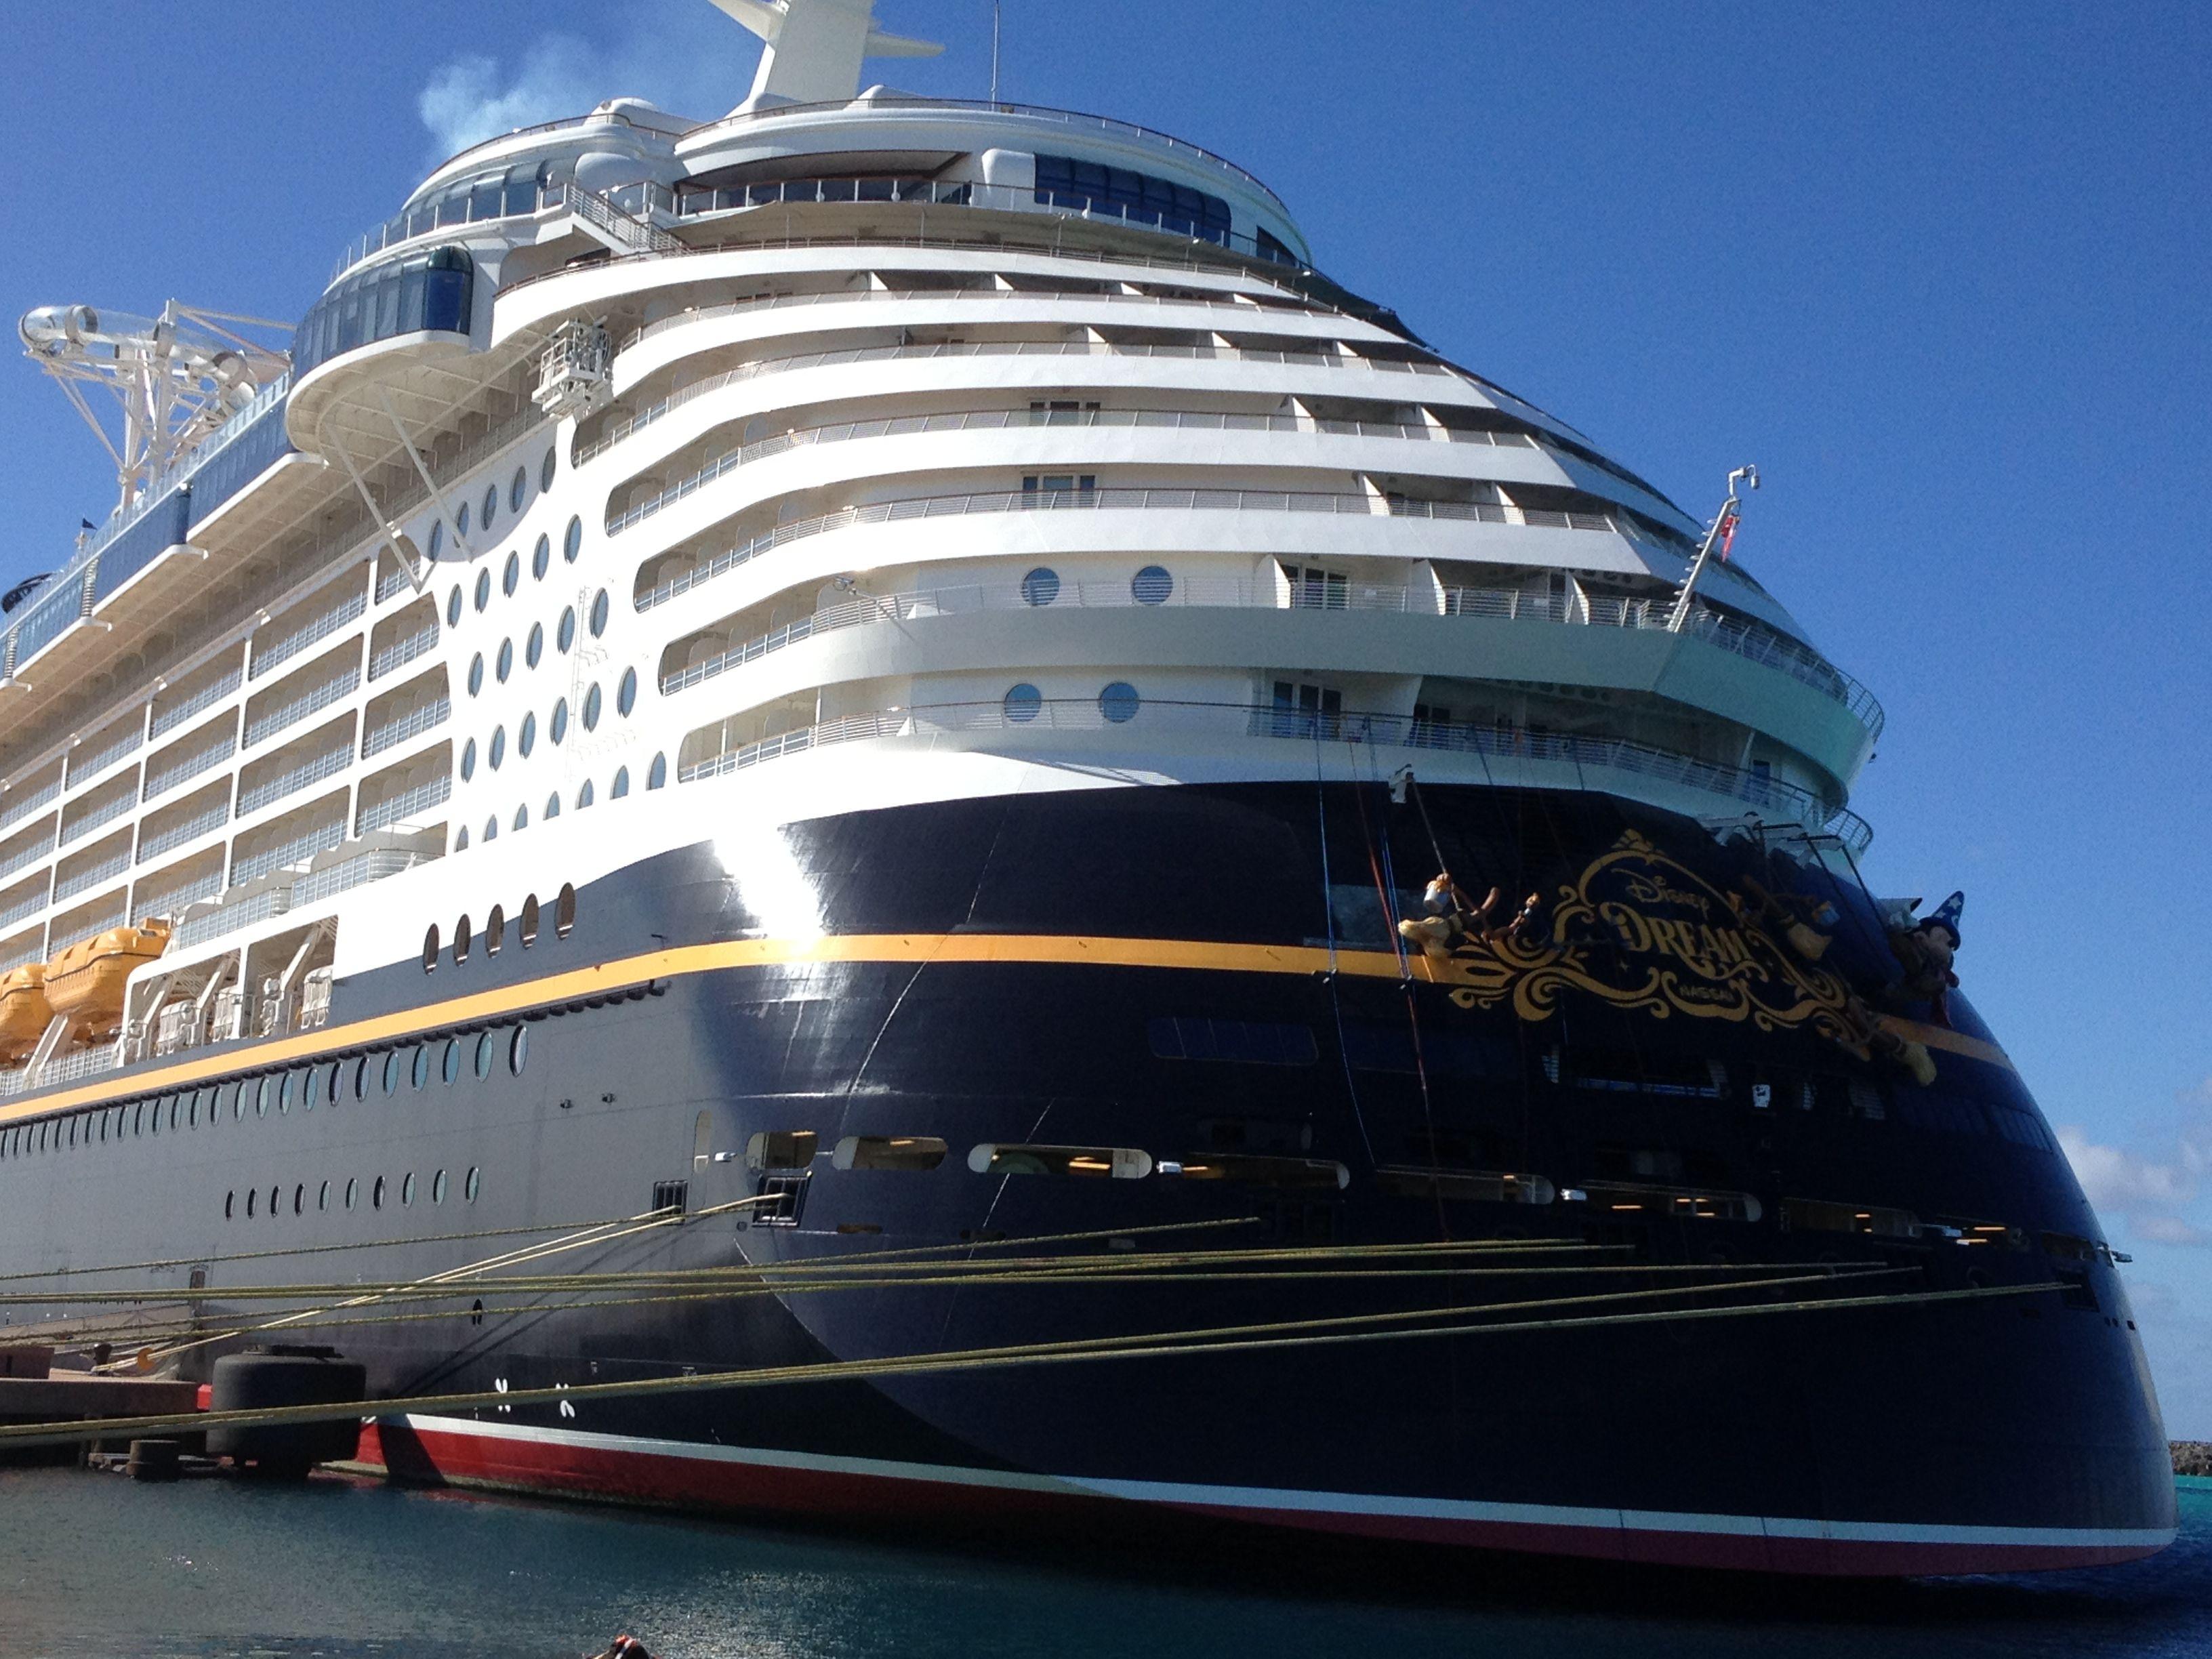 The Disney Dream Cruise Ship Is Luxurious Disney Cruise Line - Track disney cruise ship